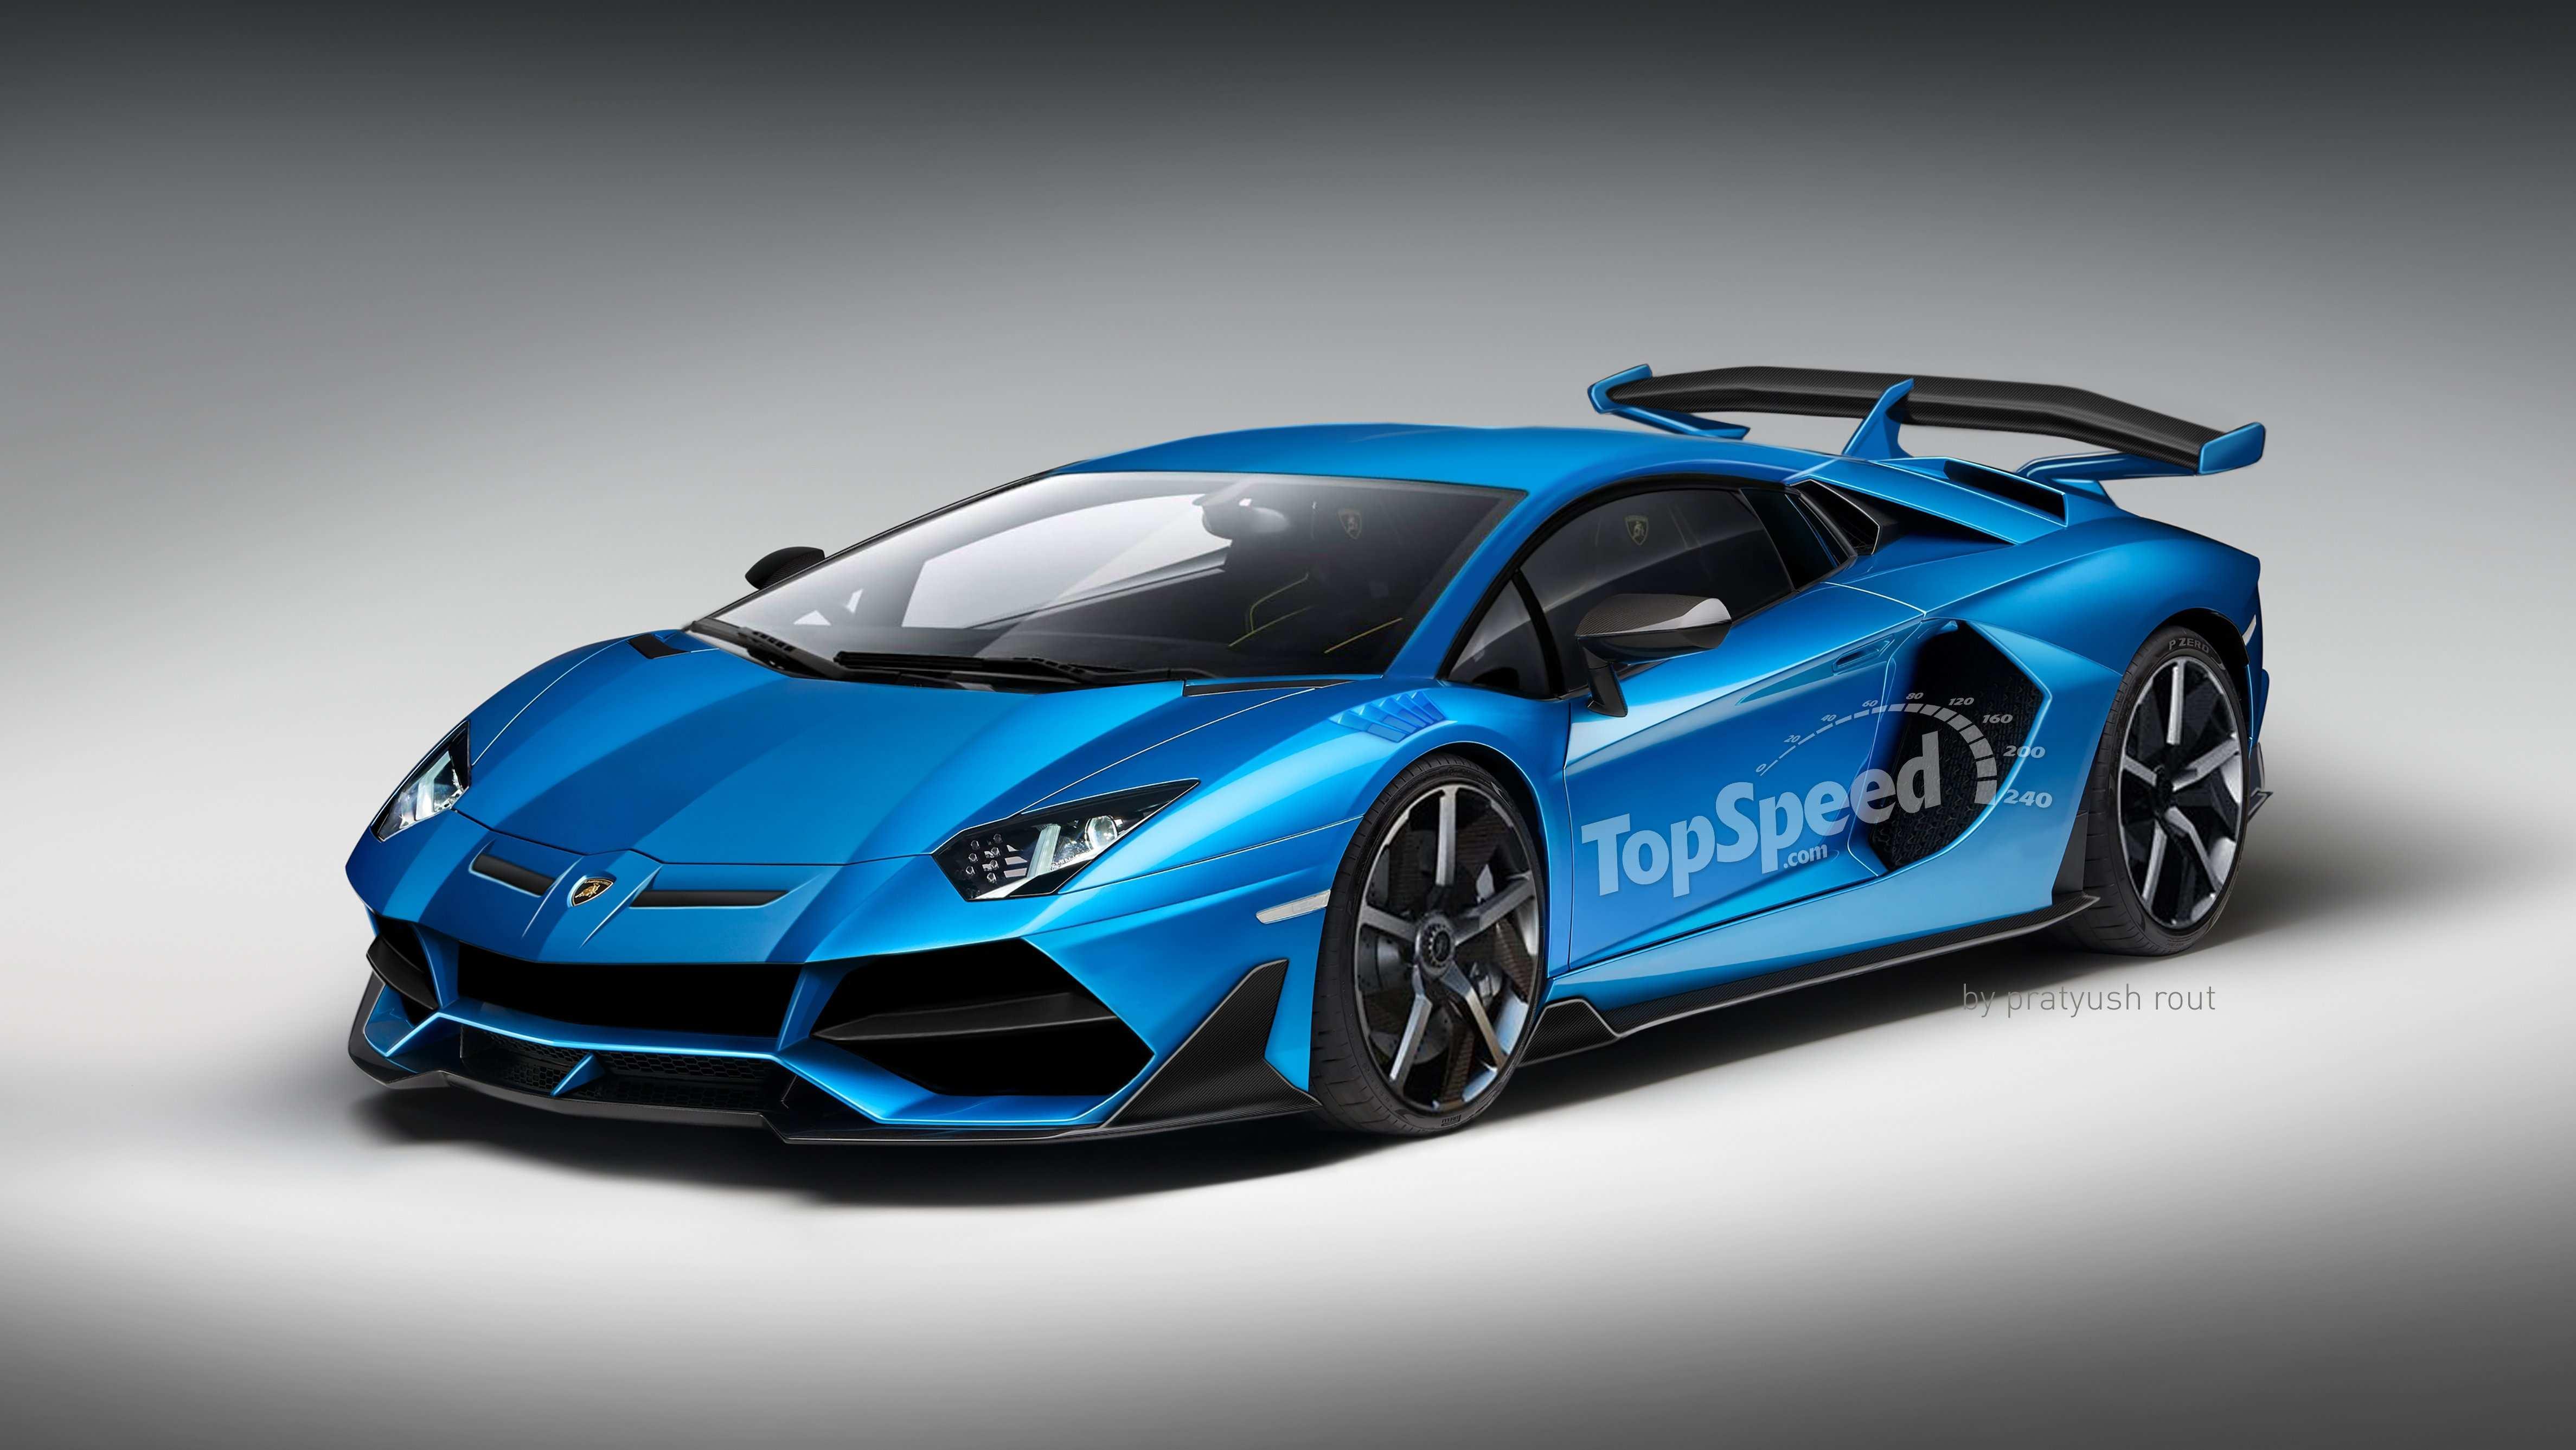 42 New New 2019 Lamborghini Images with New 2019 Lamborghini